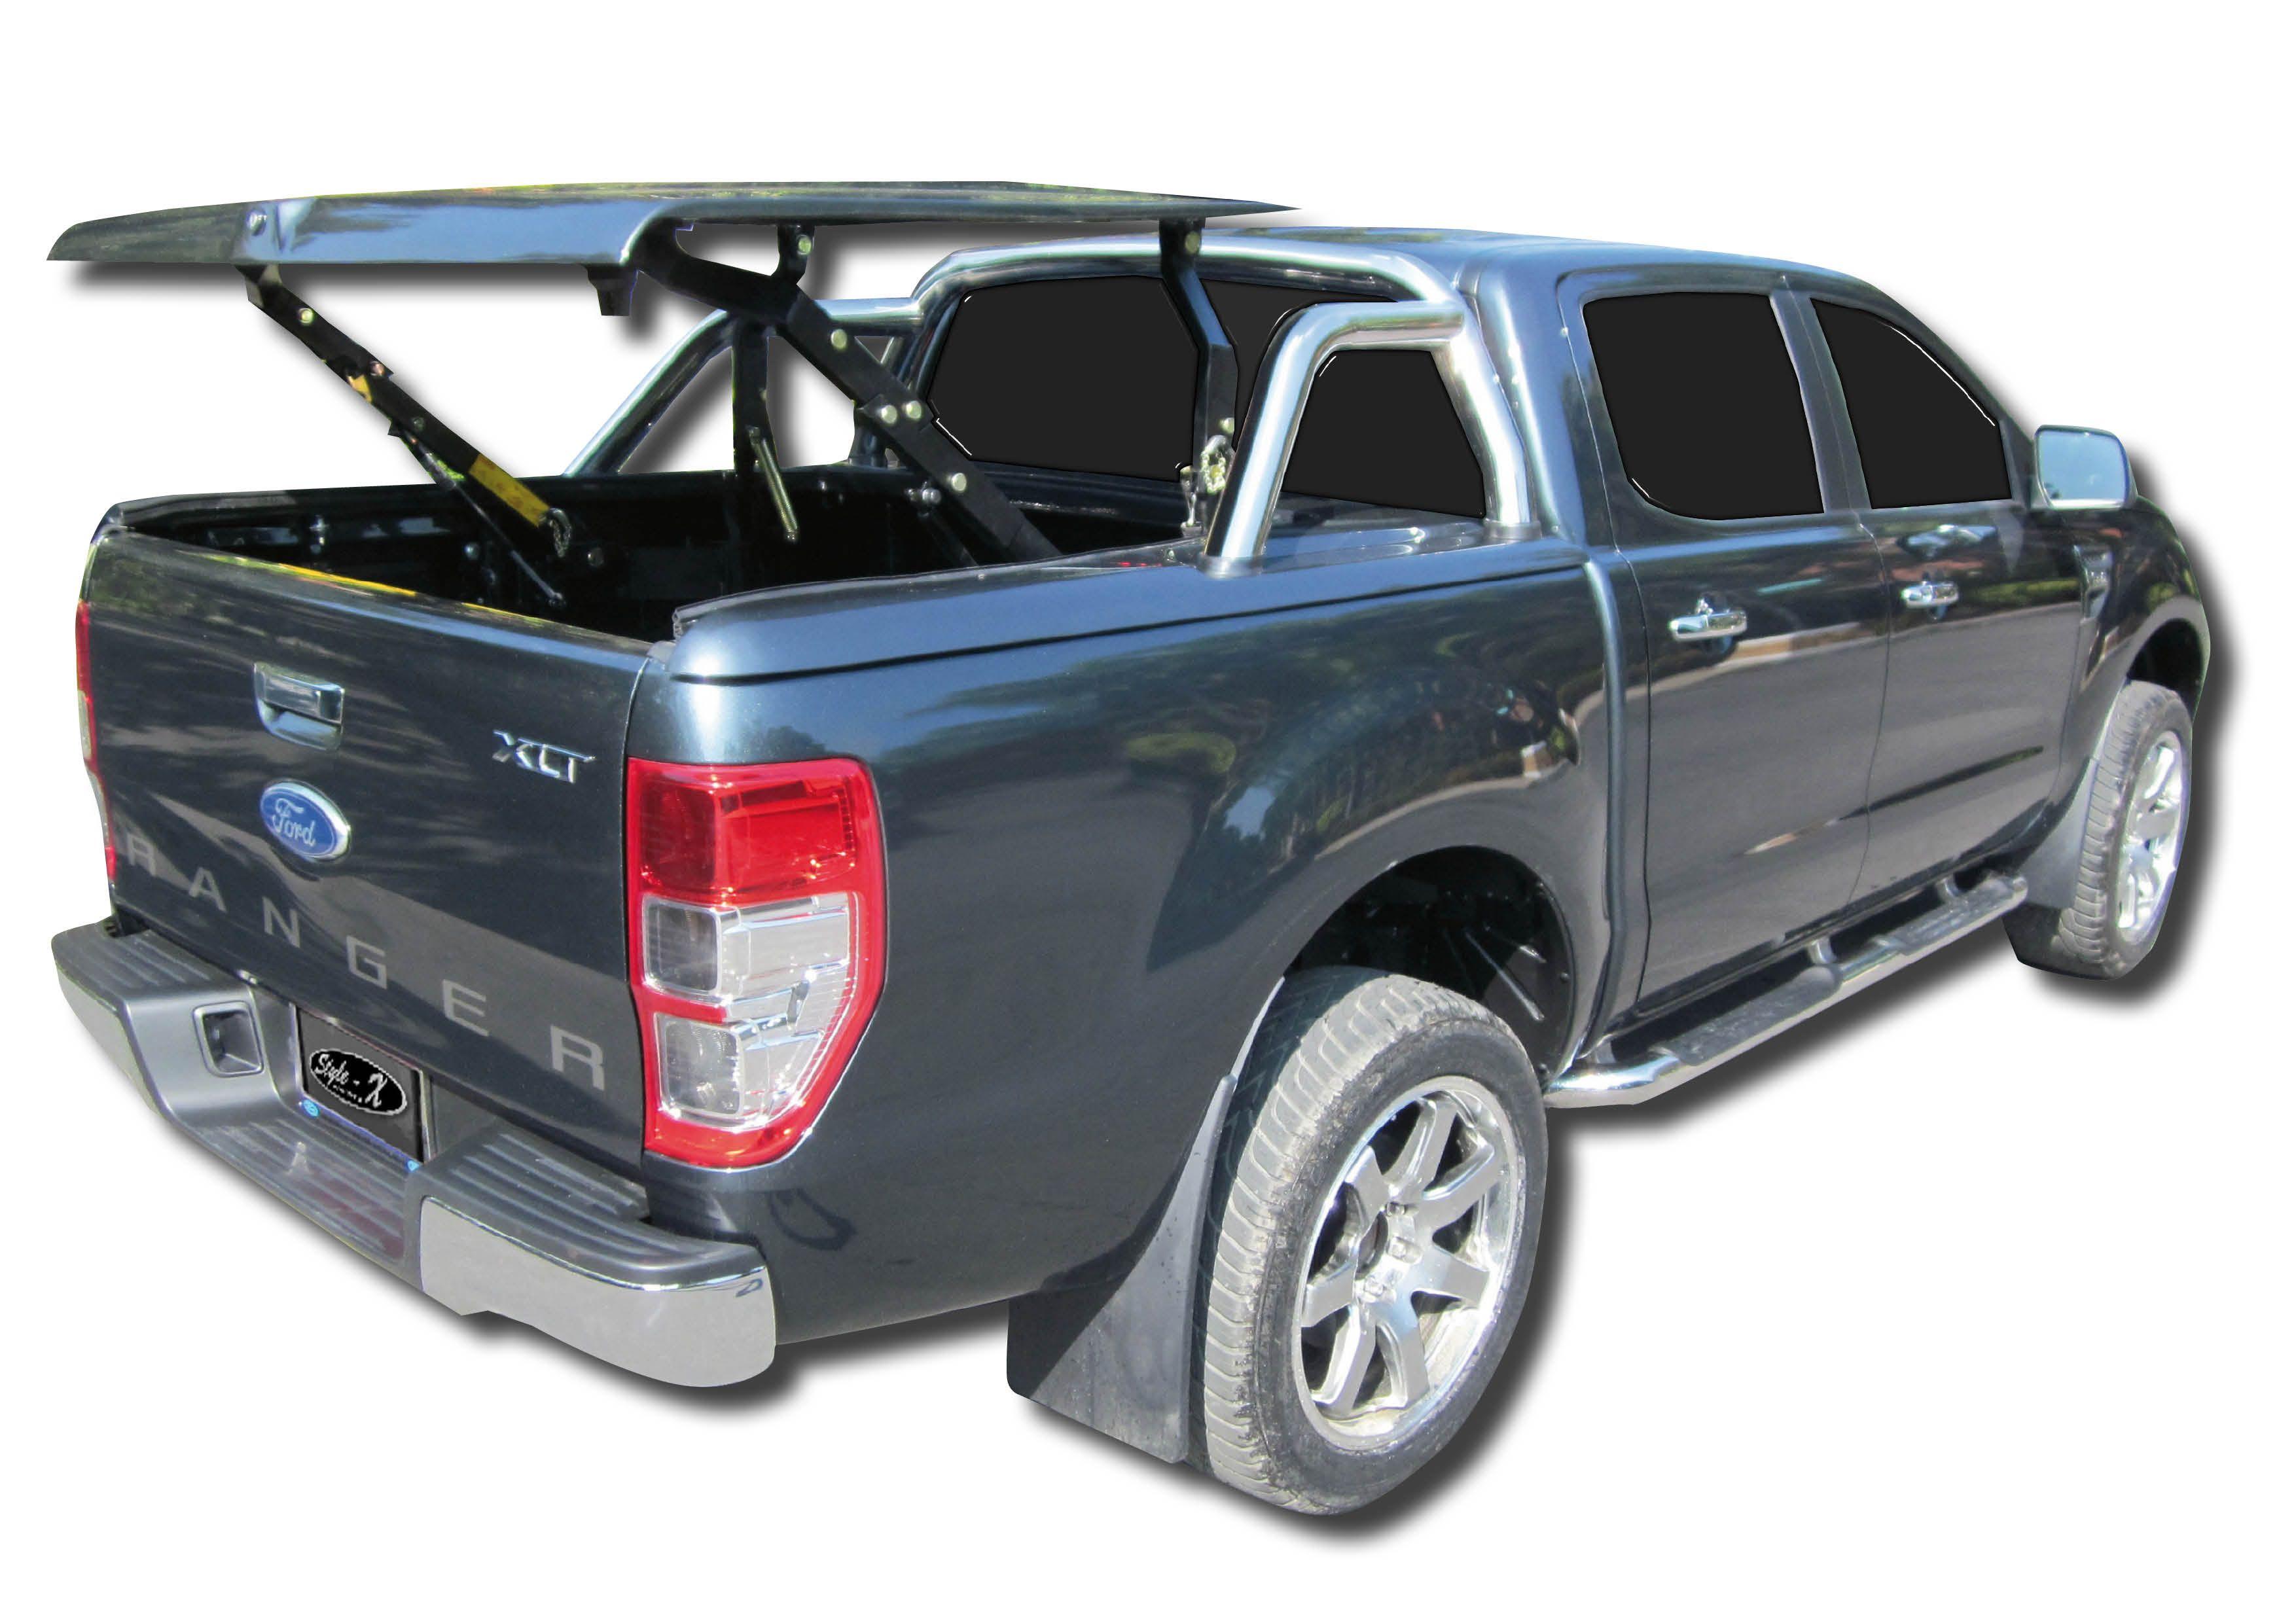 AMDA Ford ranger, Tonneau cover, Ranger truck